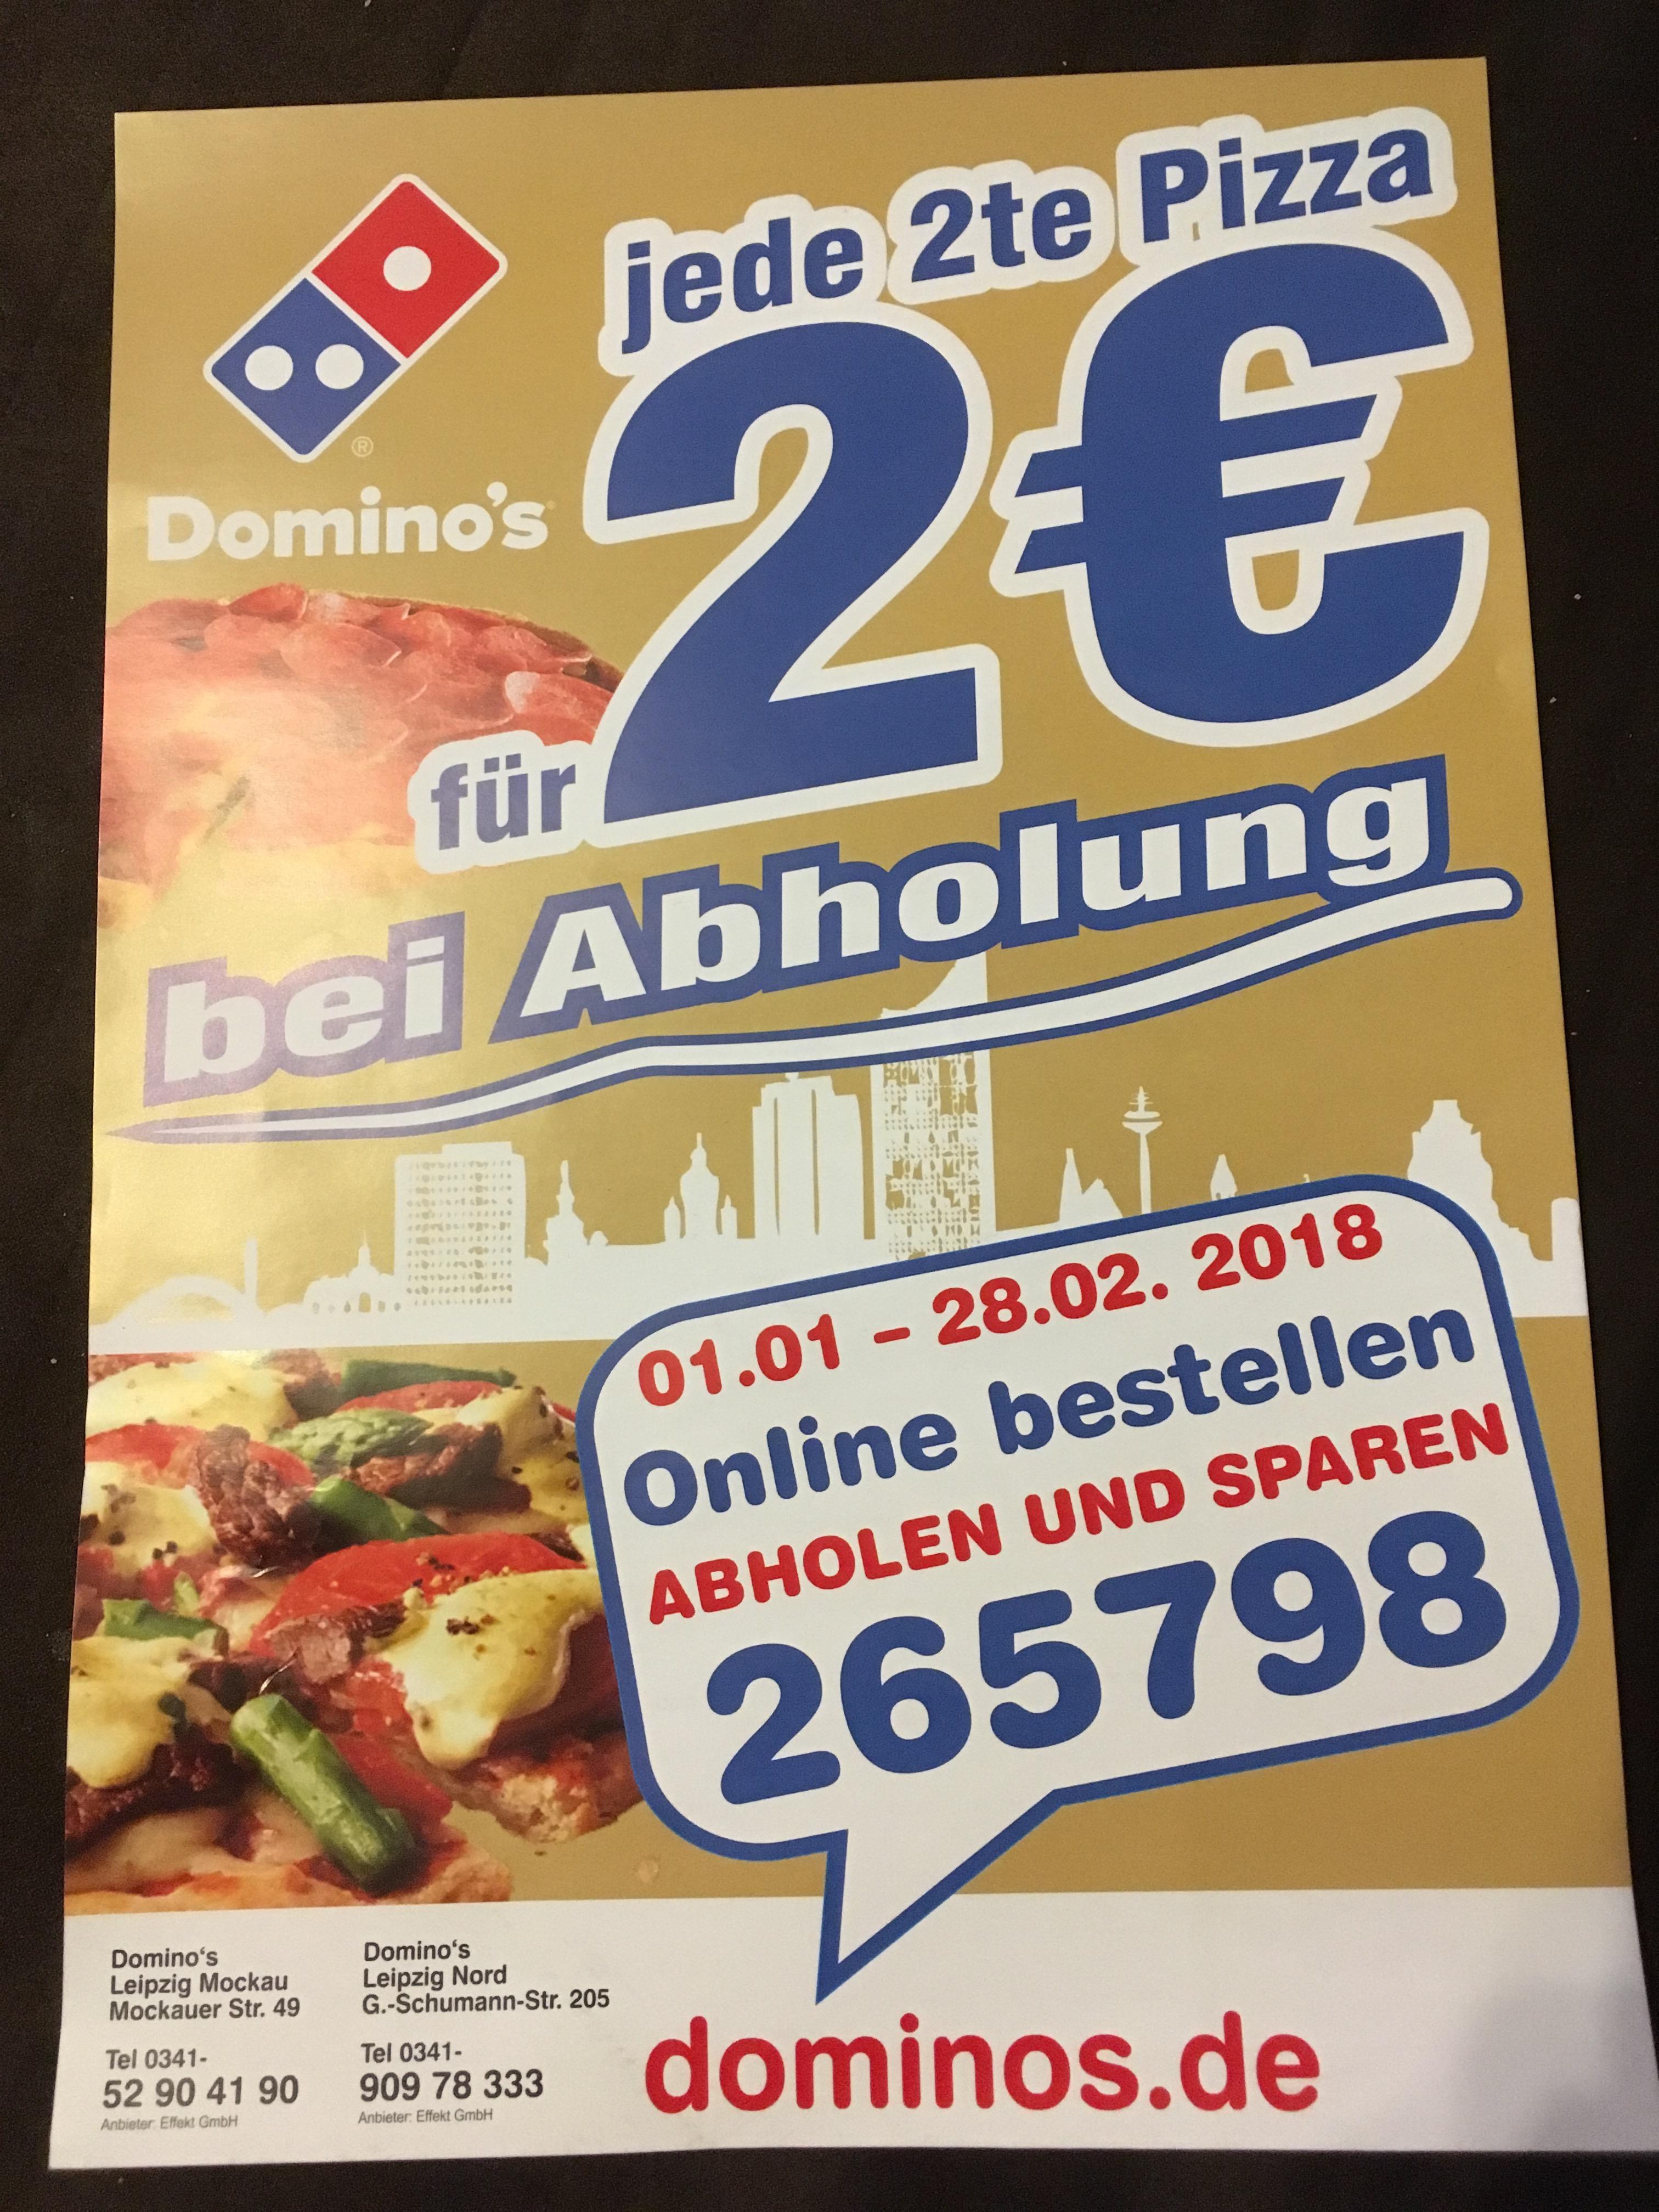 [lokal Leipzig] Dominos: jede 2. Pizza für 2 Euro bei Abholung